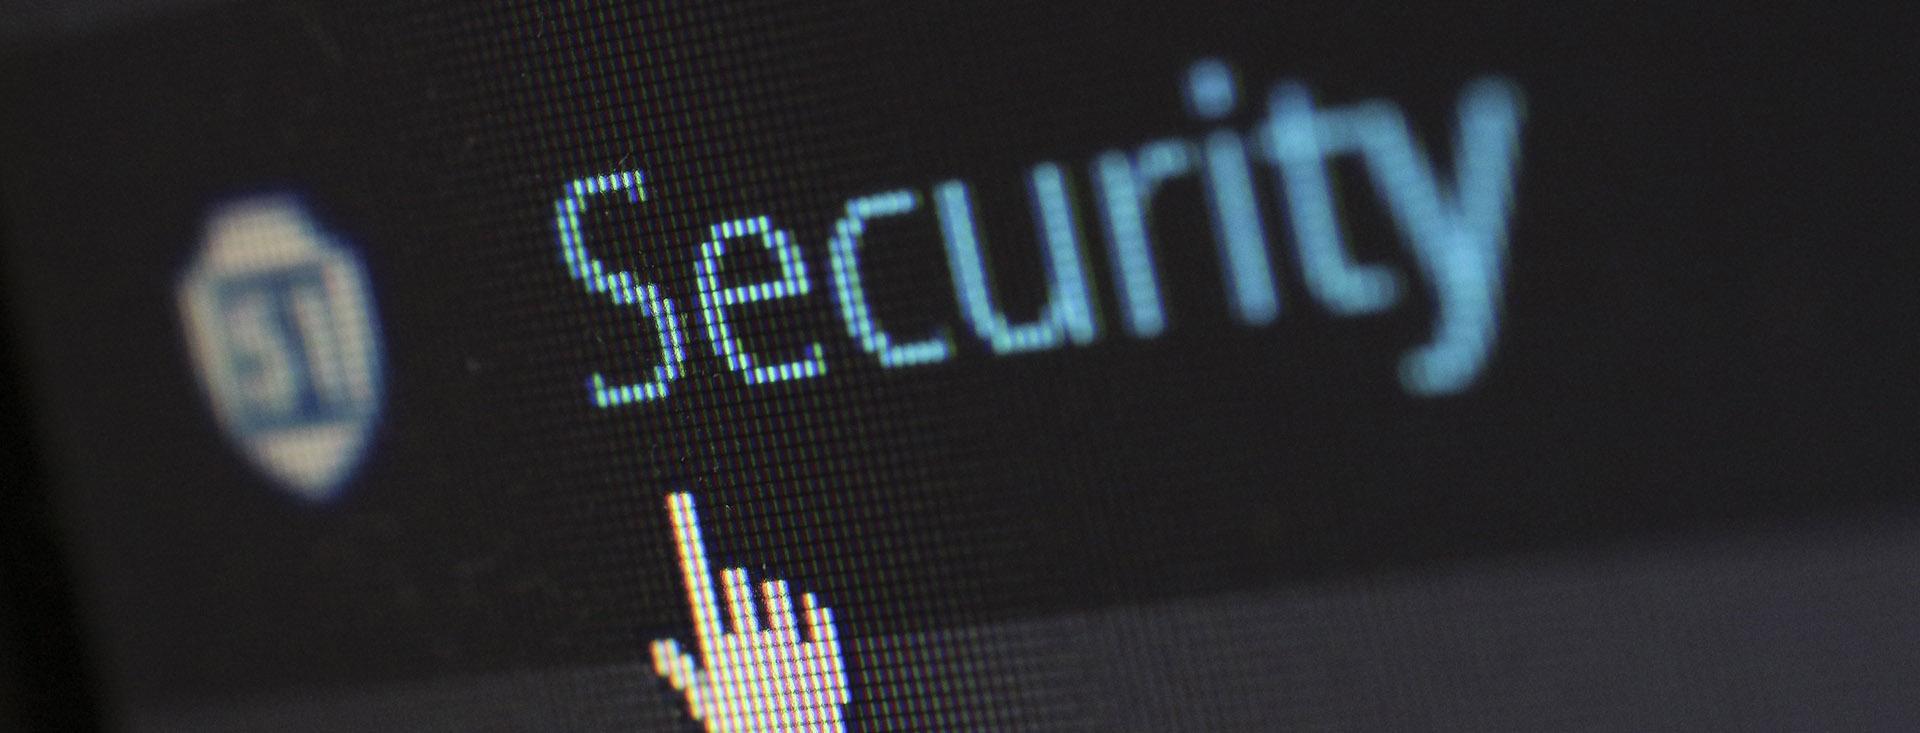 ADES - Política de privacidade